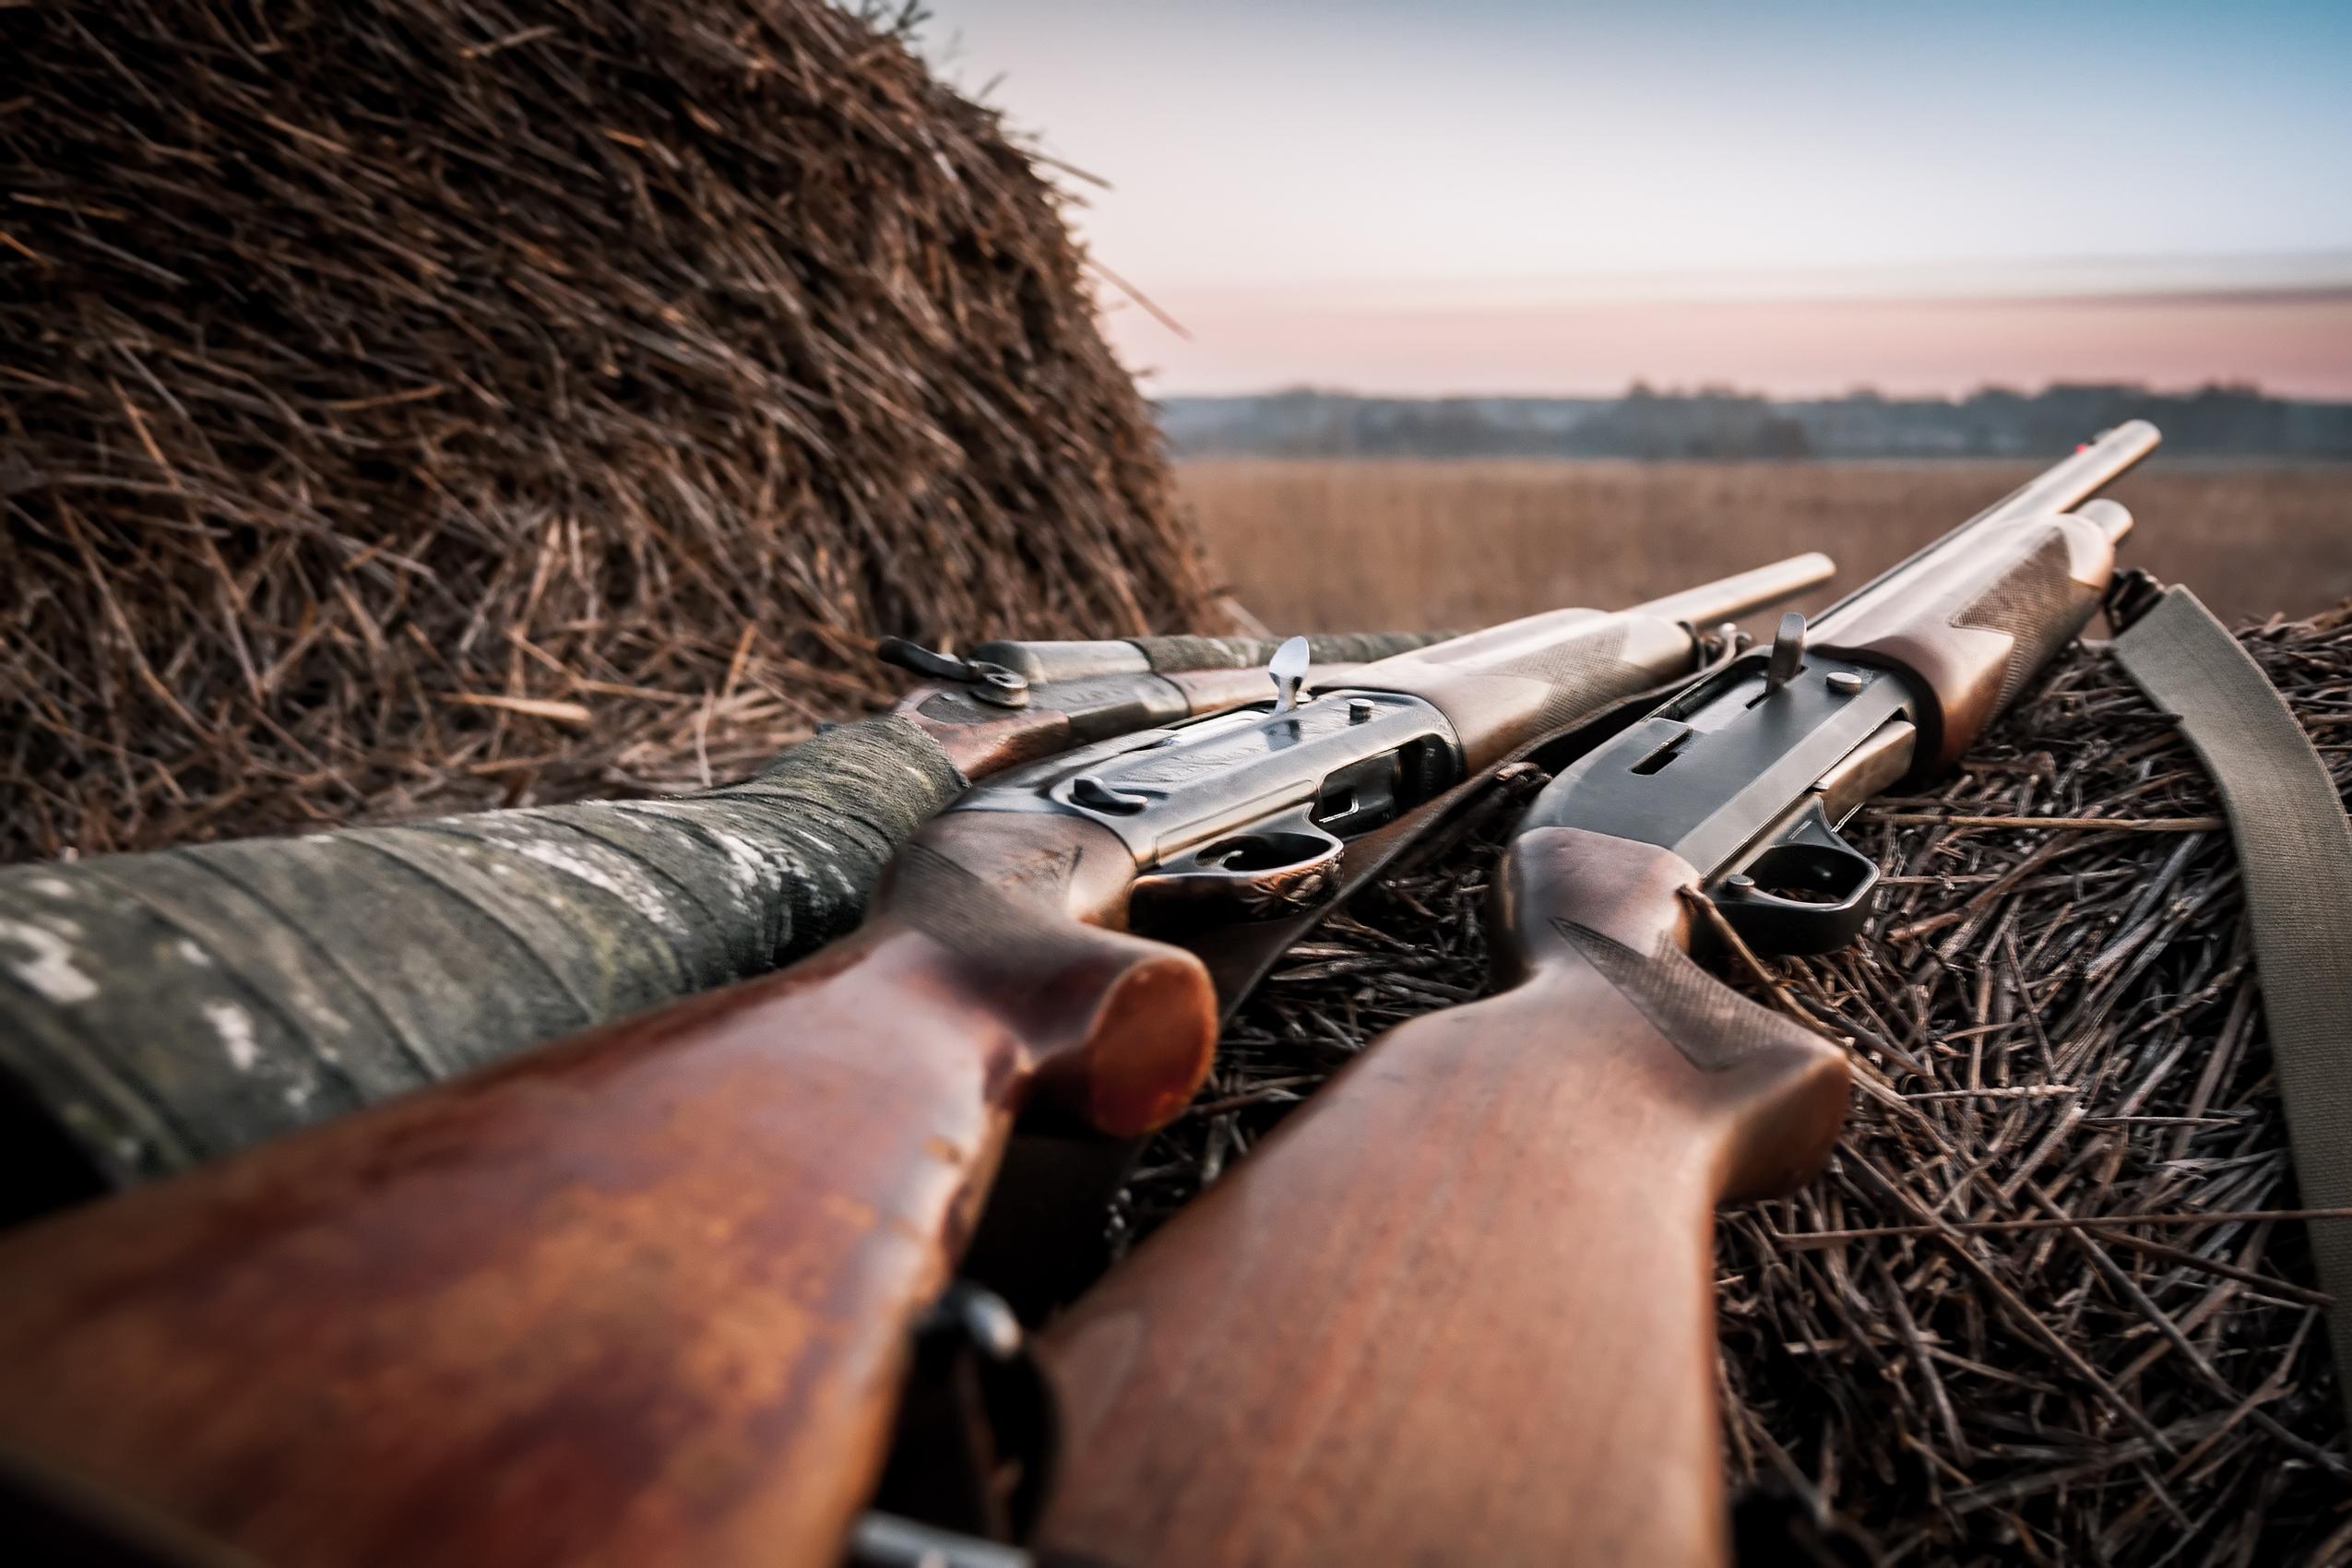 Rifles sitting on a hay bail.